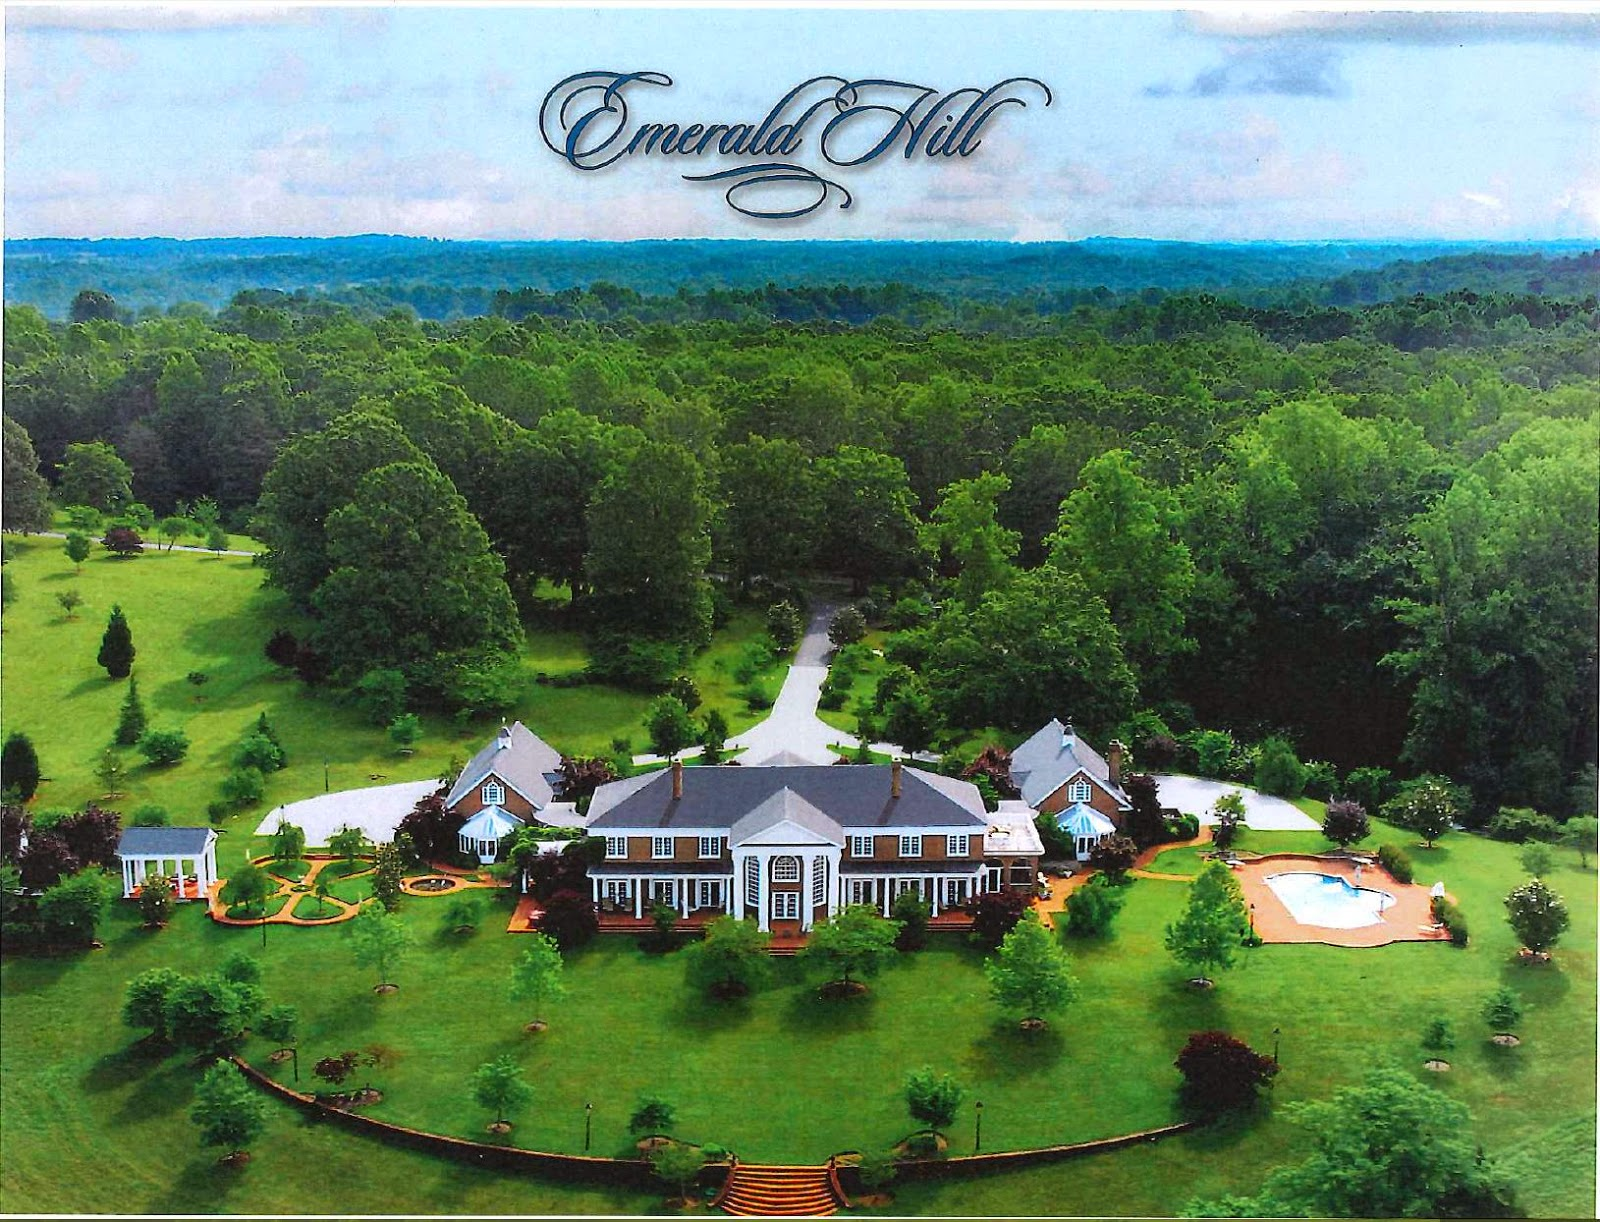 Eileen S Home Design Emerald Hill In Charlottesville Va